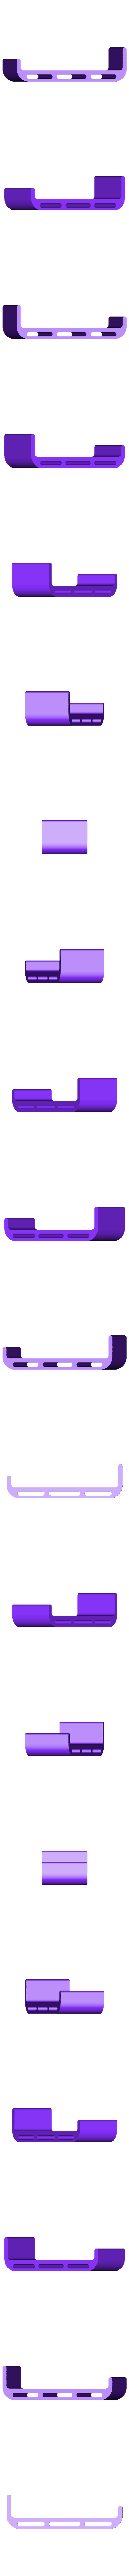 Protector_Lipo_1300.obj Download free OBJ file Protector lipo 1300/1500 dron • 3D print template, PaulDrones